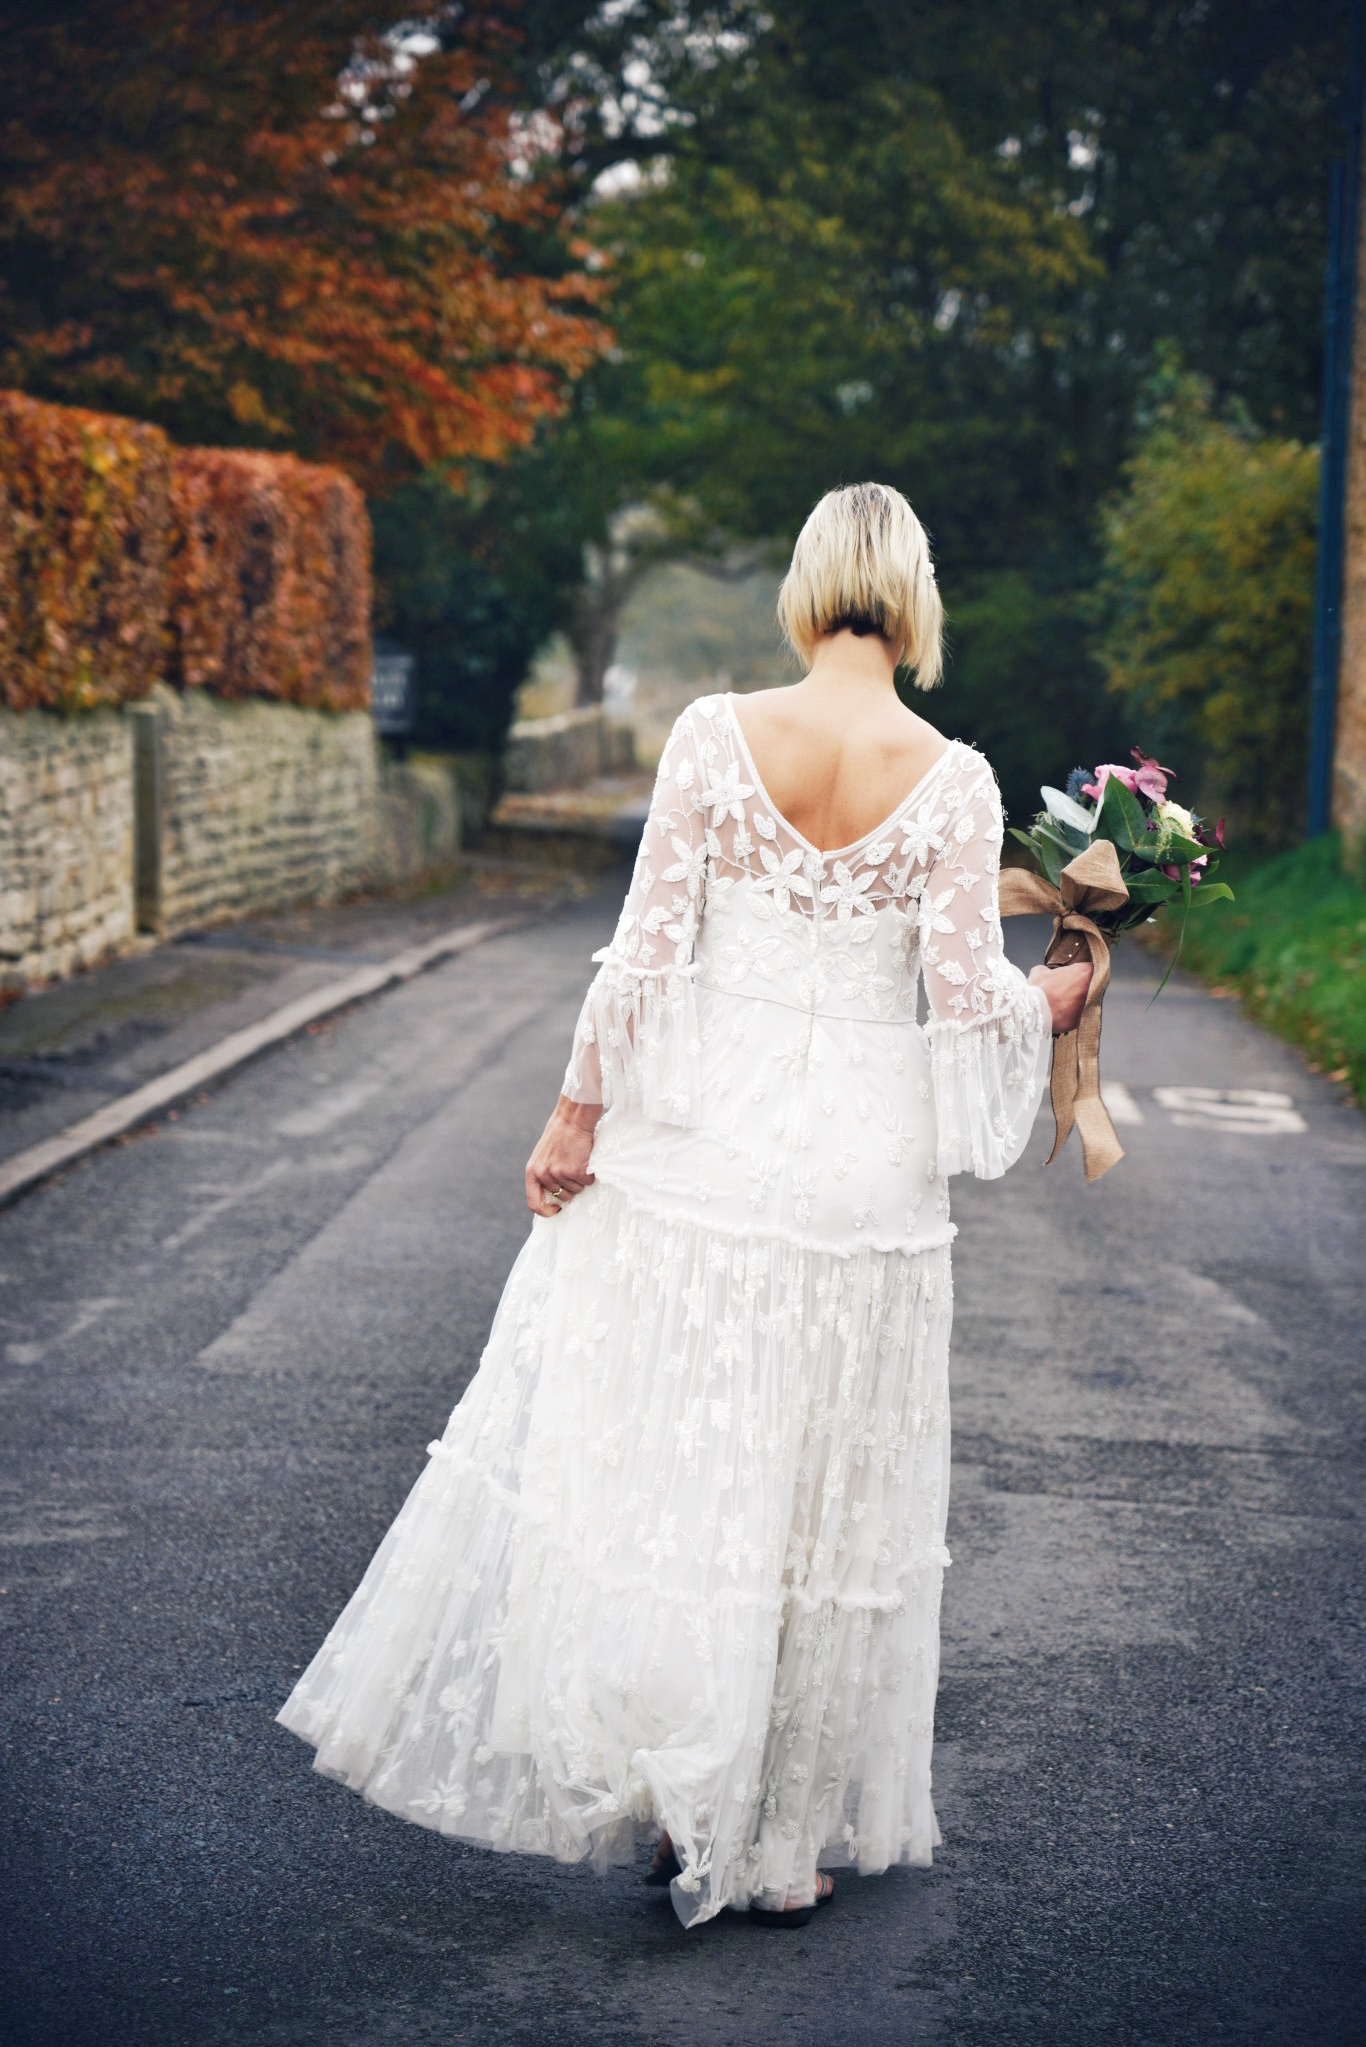 Bridal Boutique near Sheffield